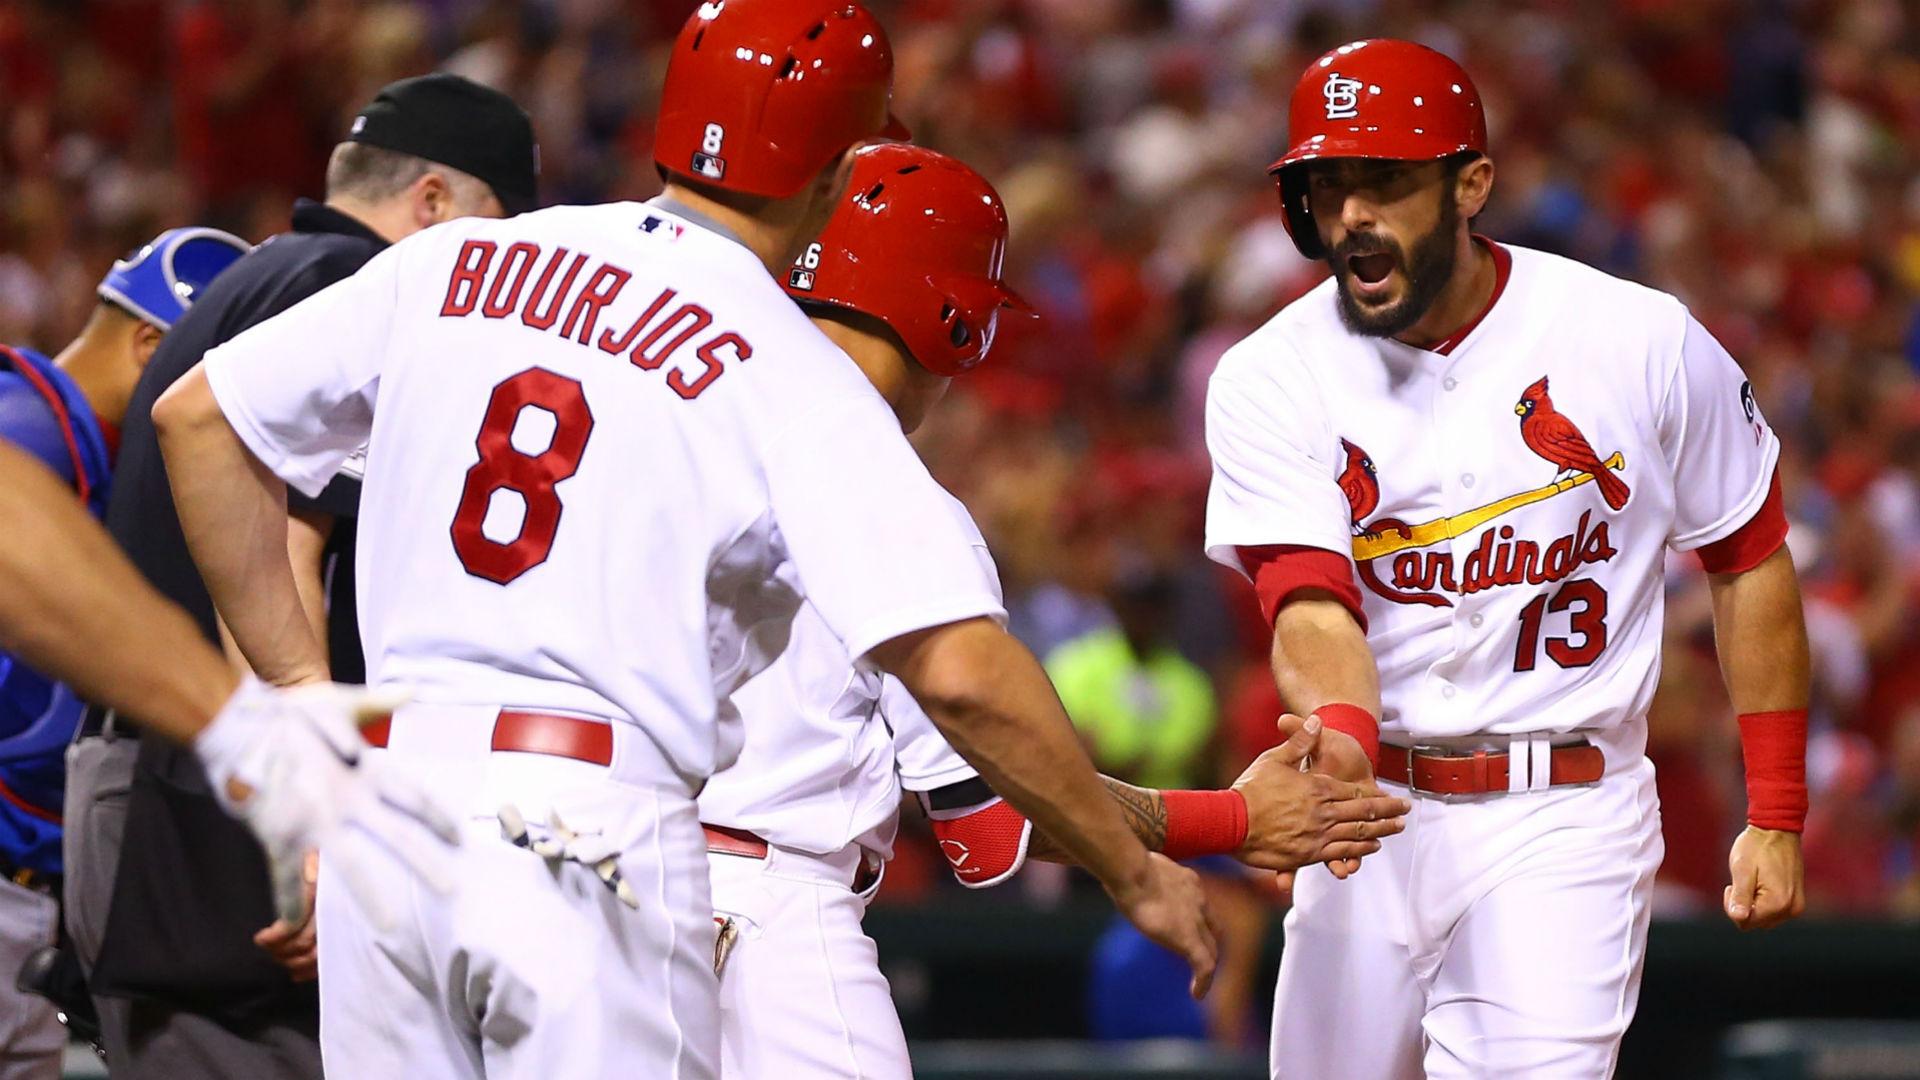 MLB Nightly 9: Carpenter helps Cardinals make history